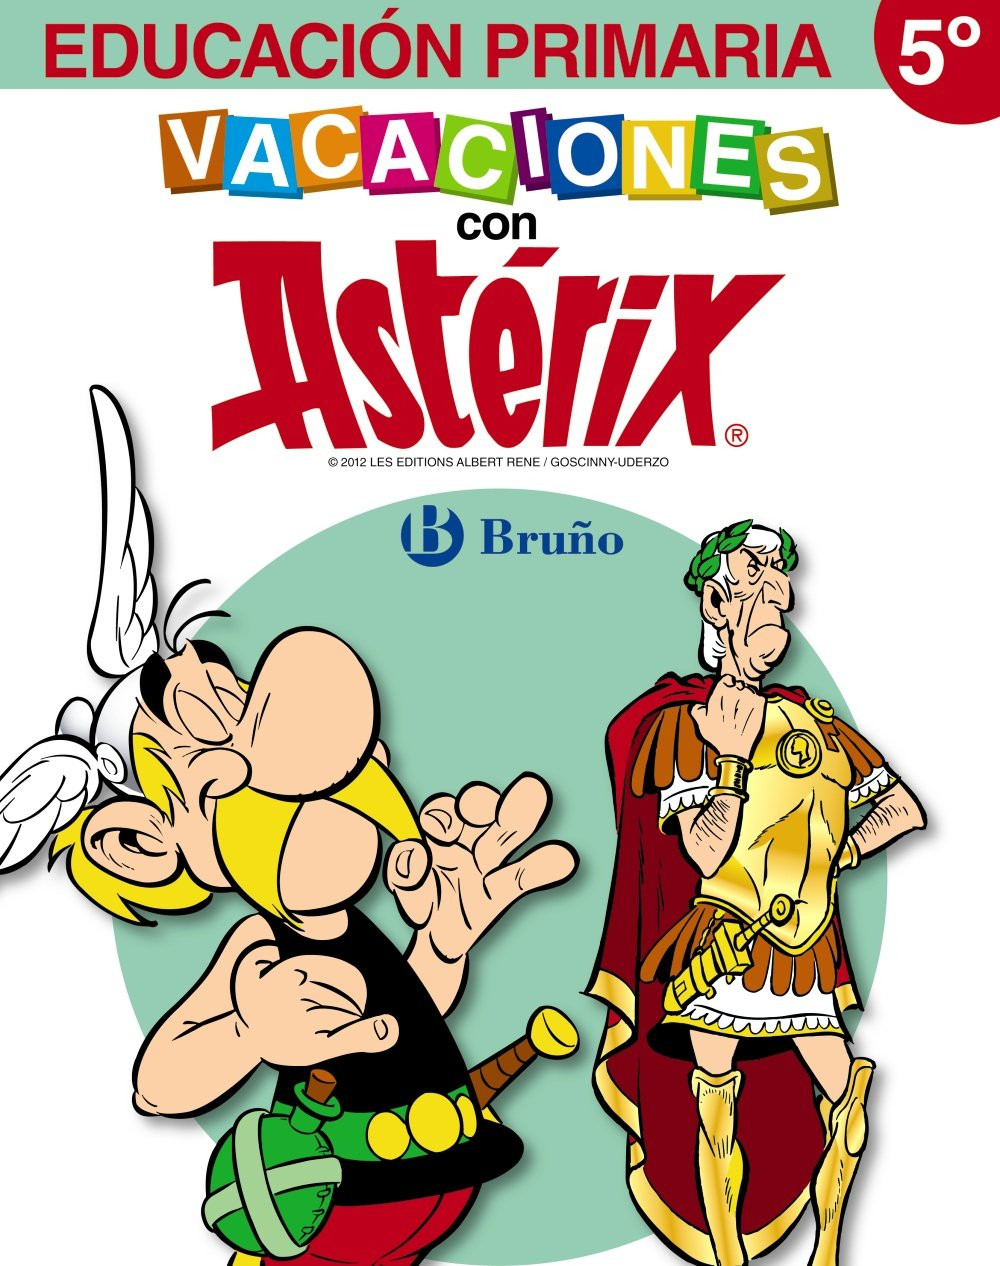 Vacaciones con Astérix 5º Primaria (Spanish) Paperback – April 27, 2012